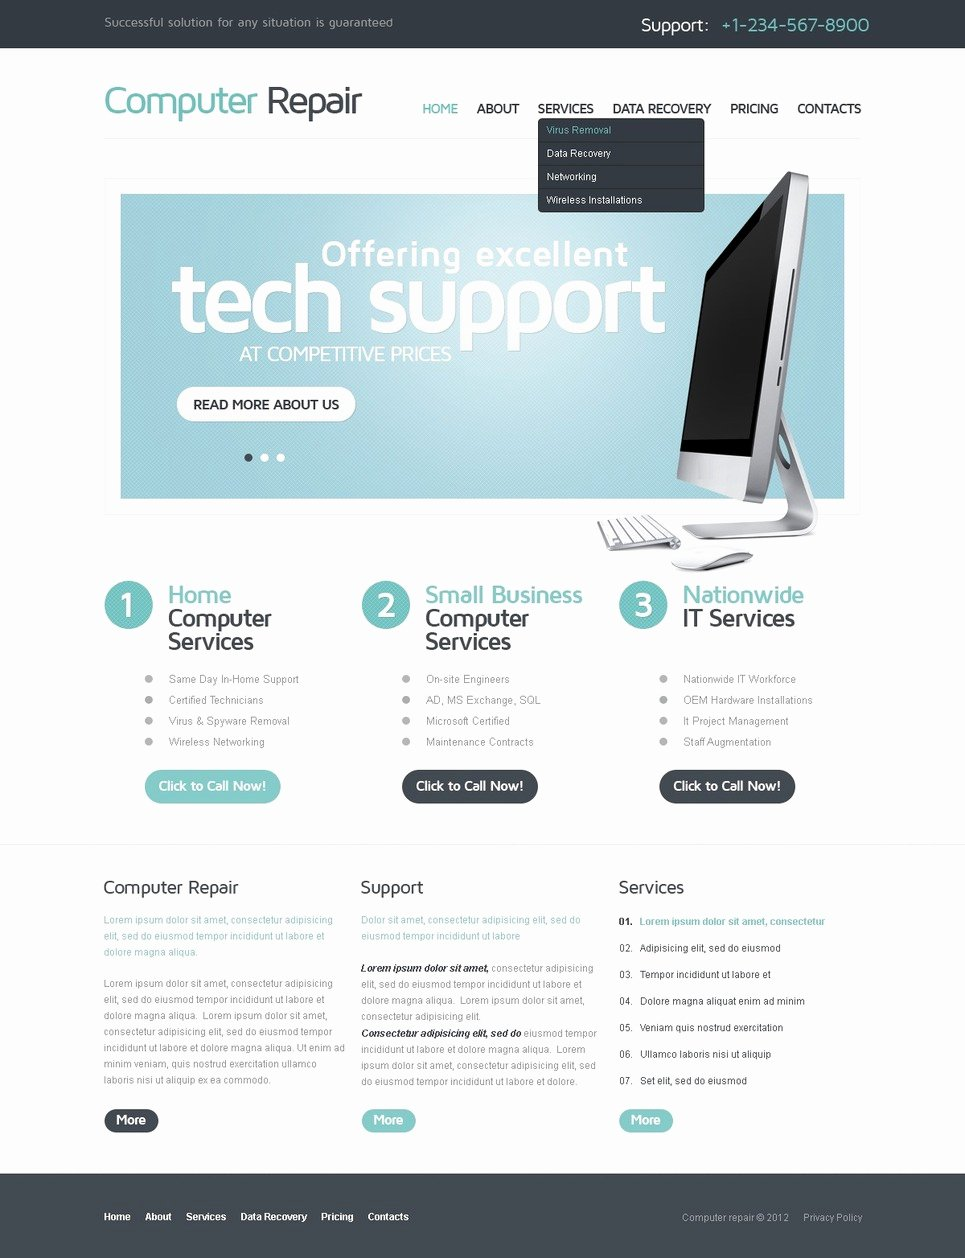 Free Computer Repair Website Template Lovely Puter Repair Website Template